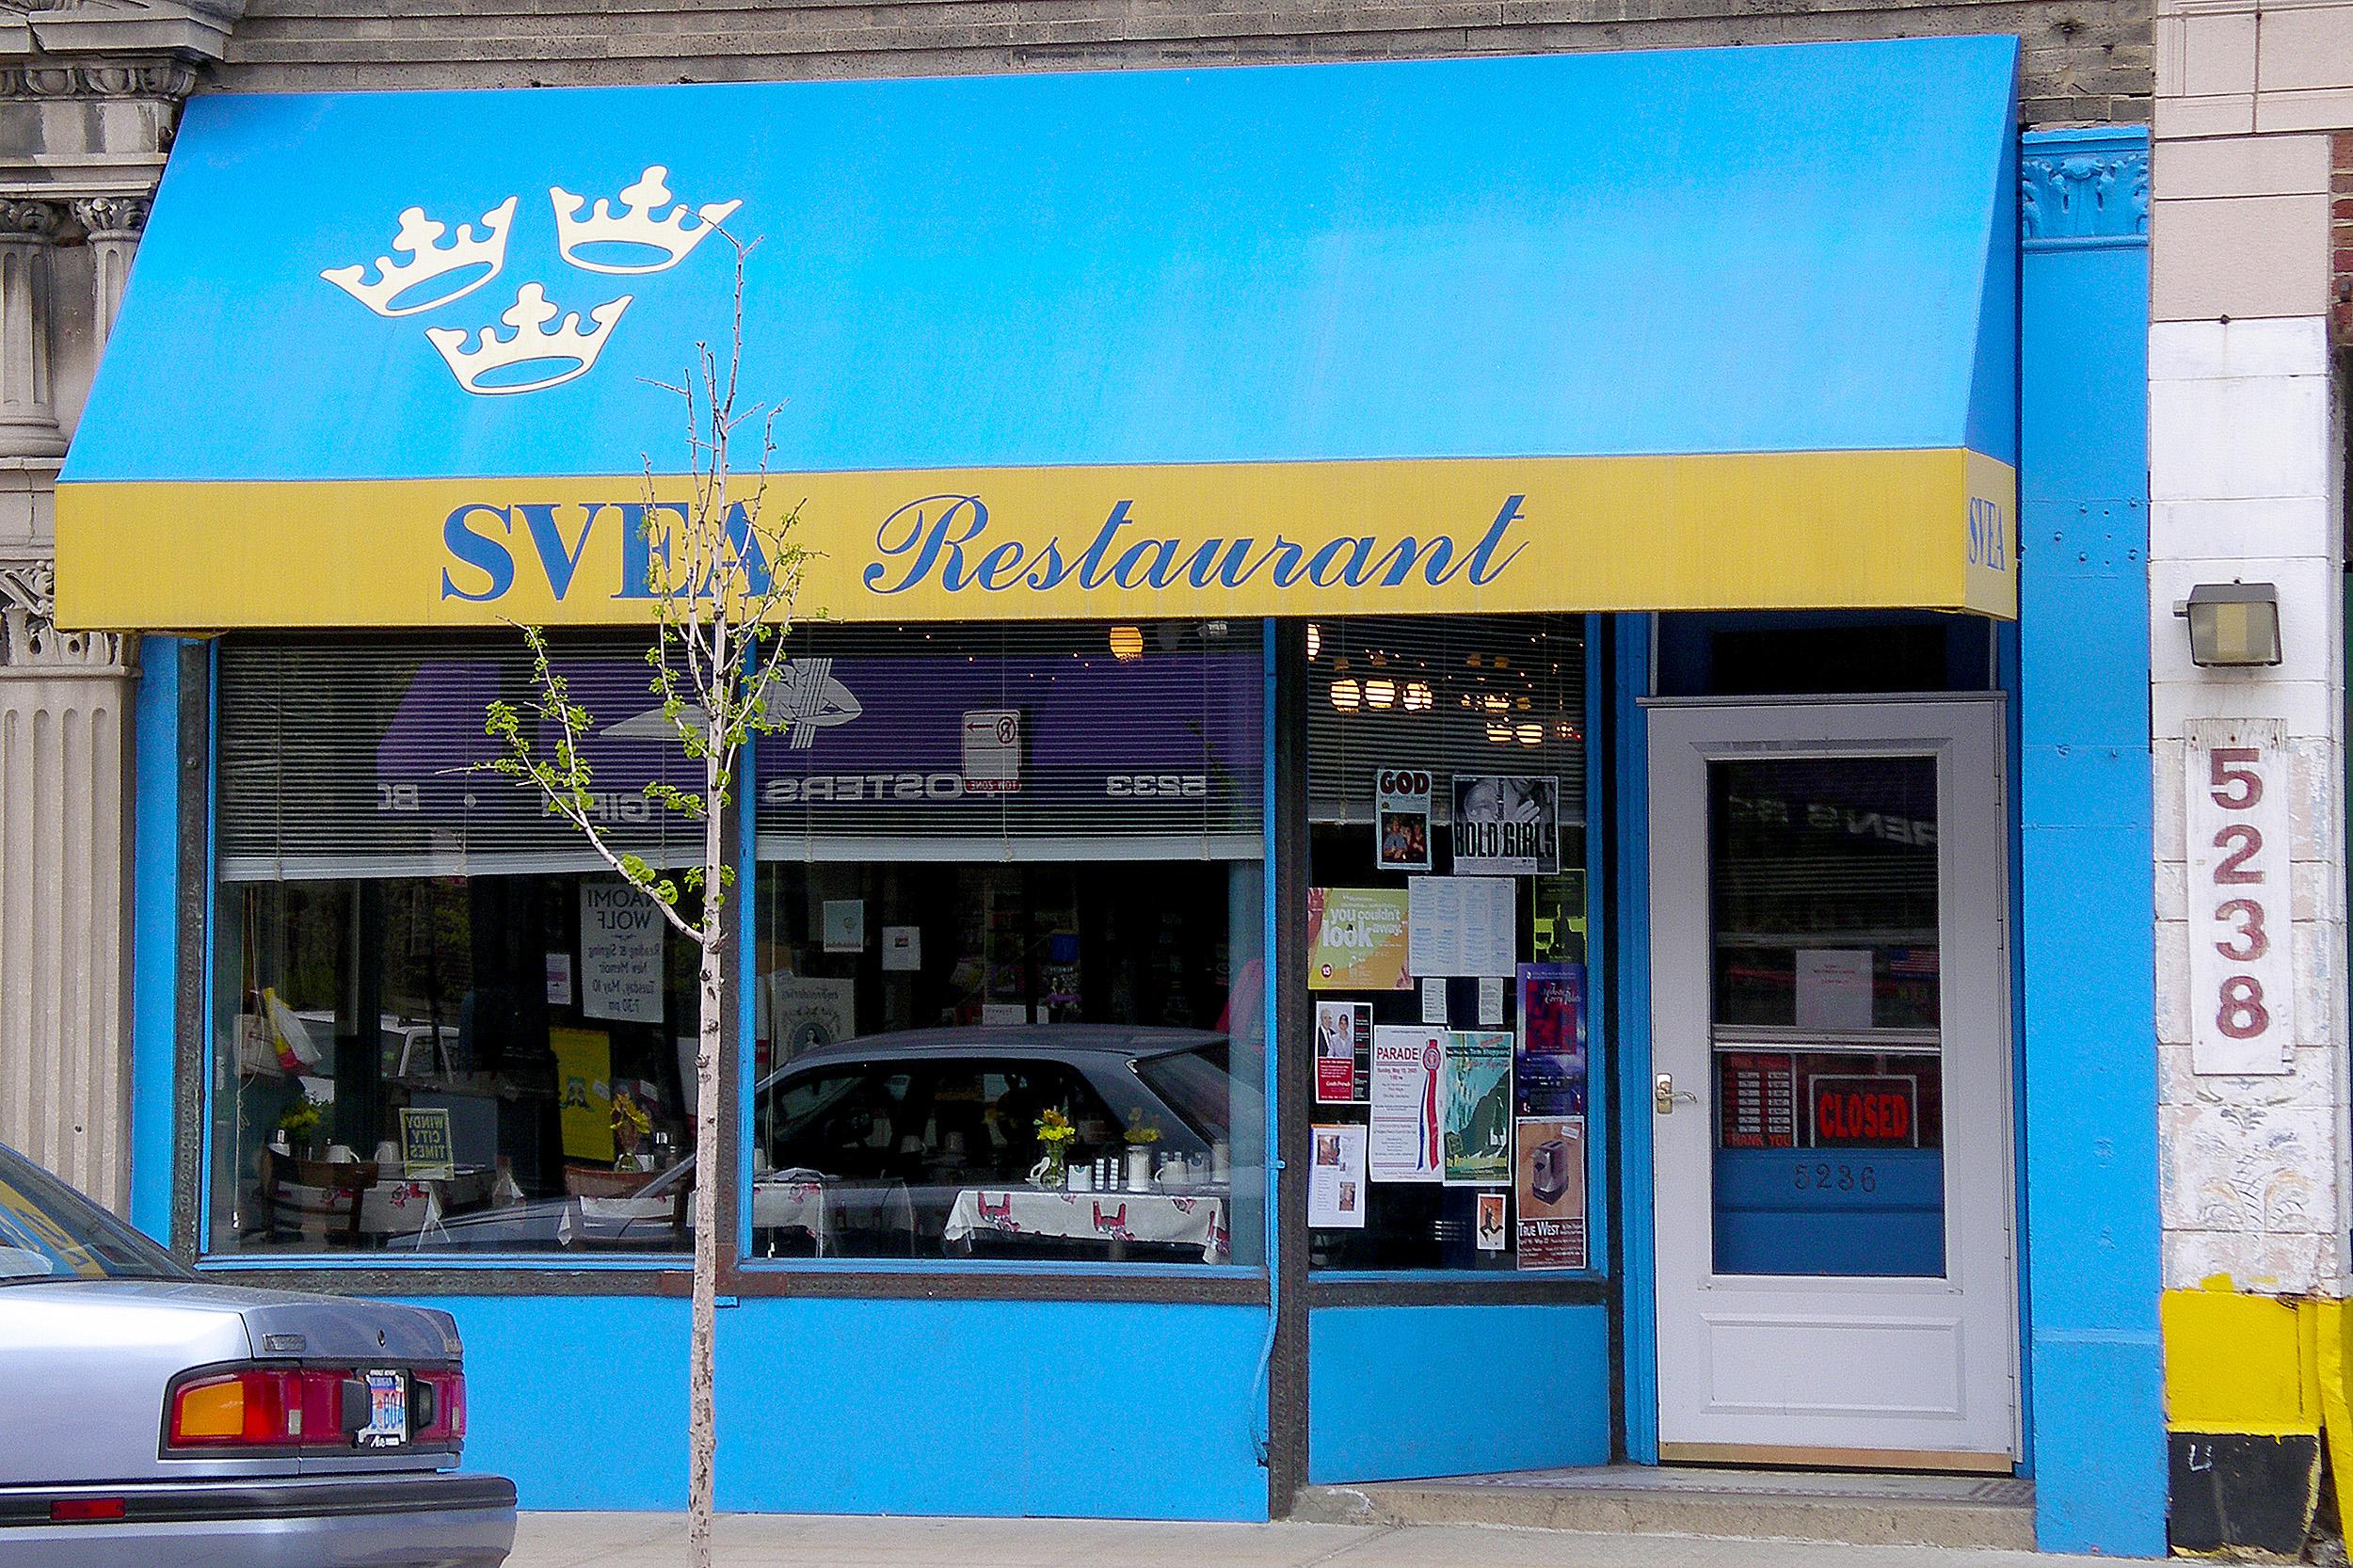 Svea Restaurant Andersonville Chicago